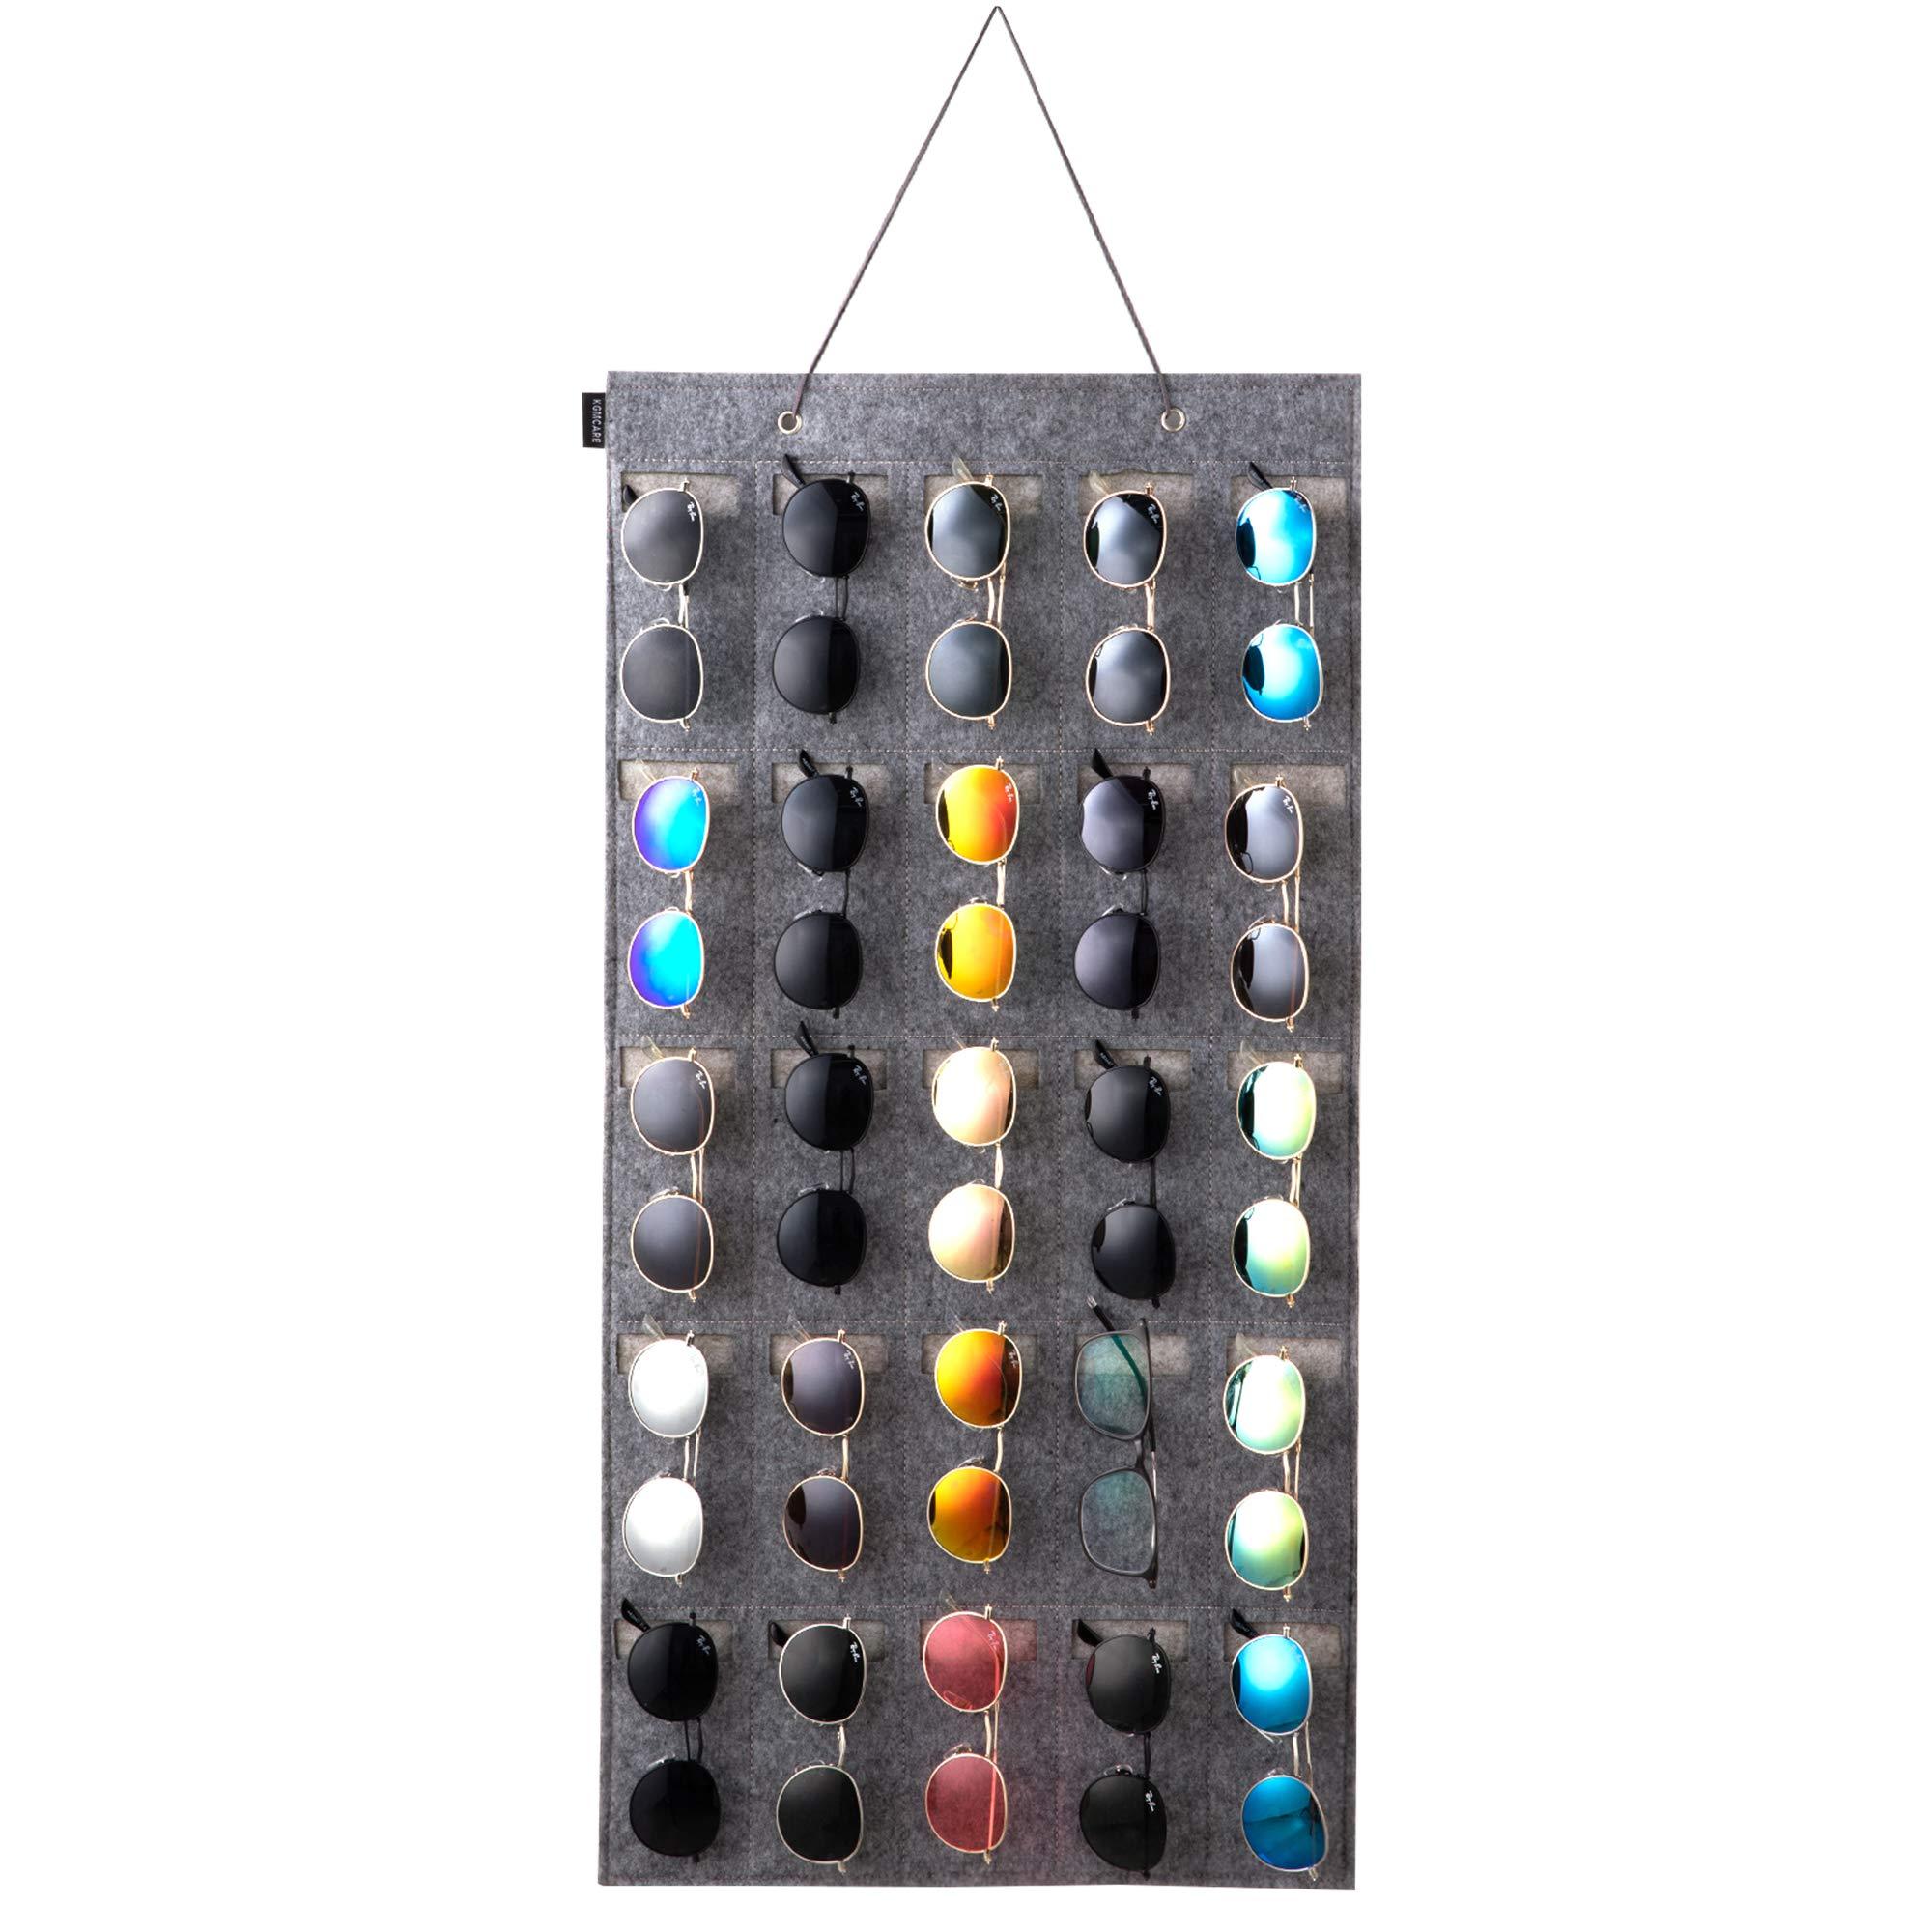 KGMCARE Sunglasses Organizer Storage- Hanging